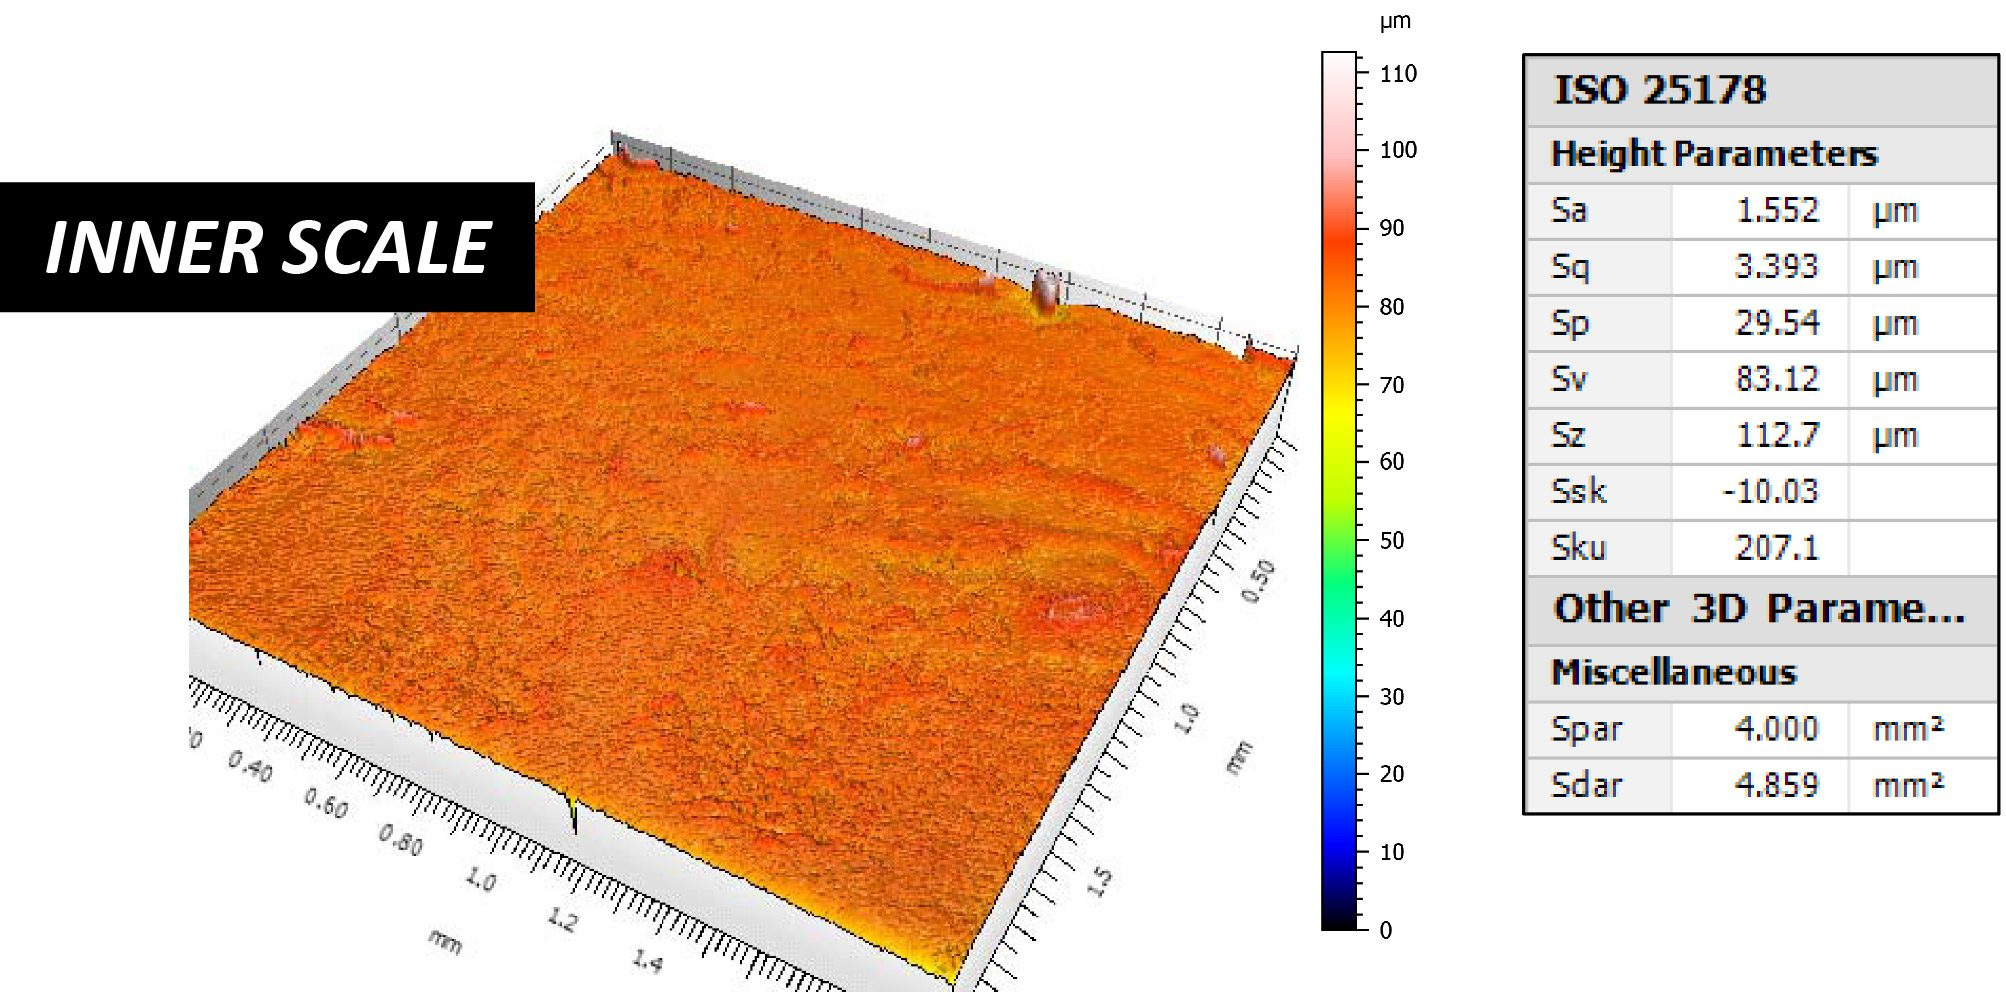 Fish Scale Profilometer 3D Scanning